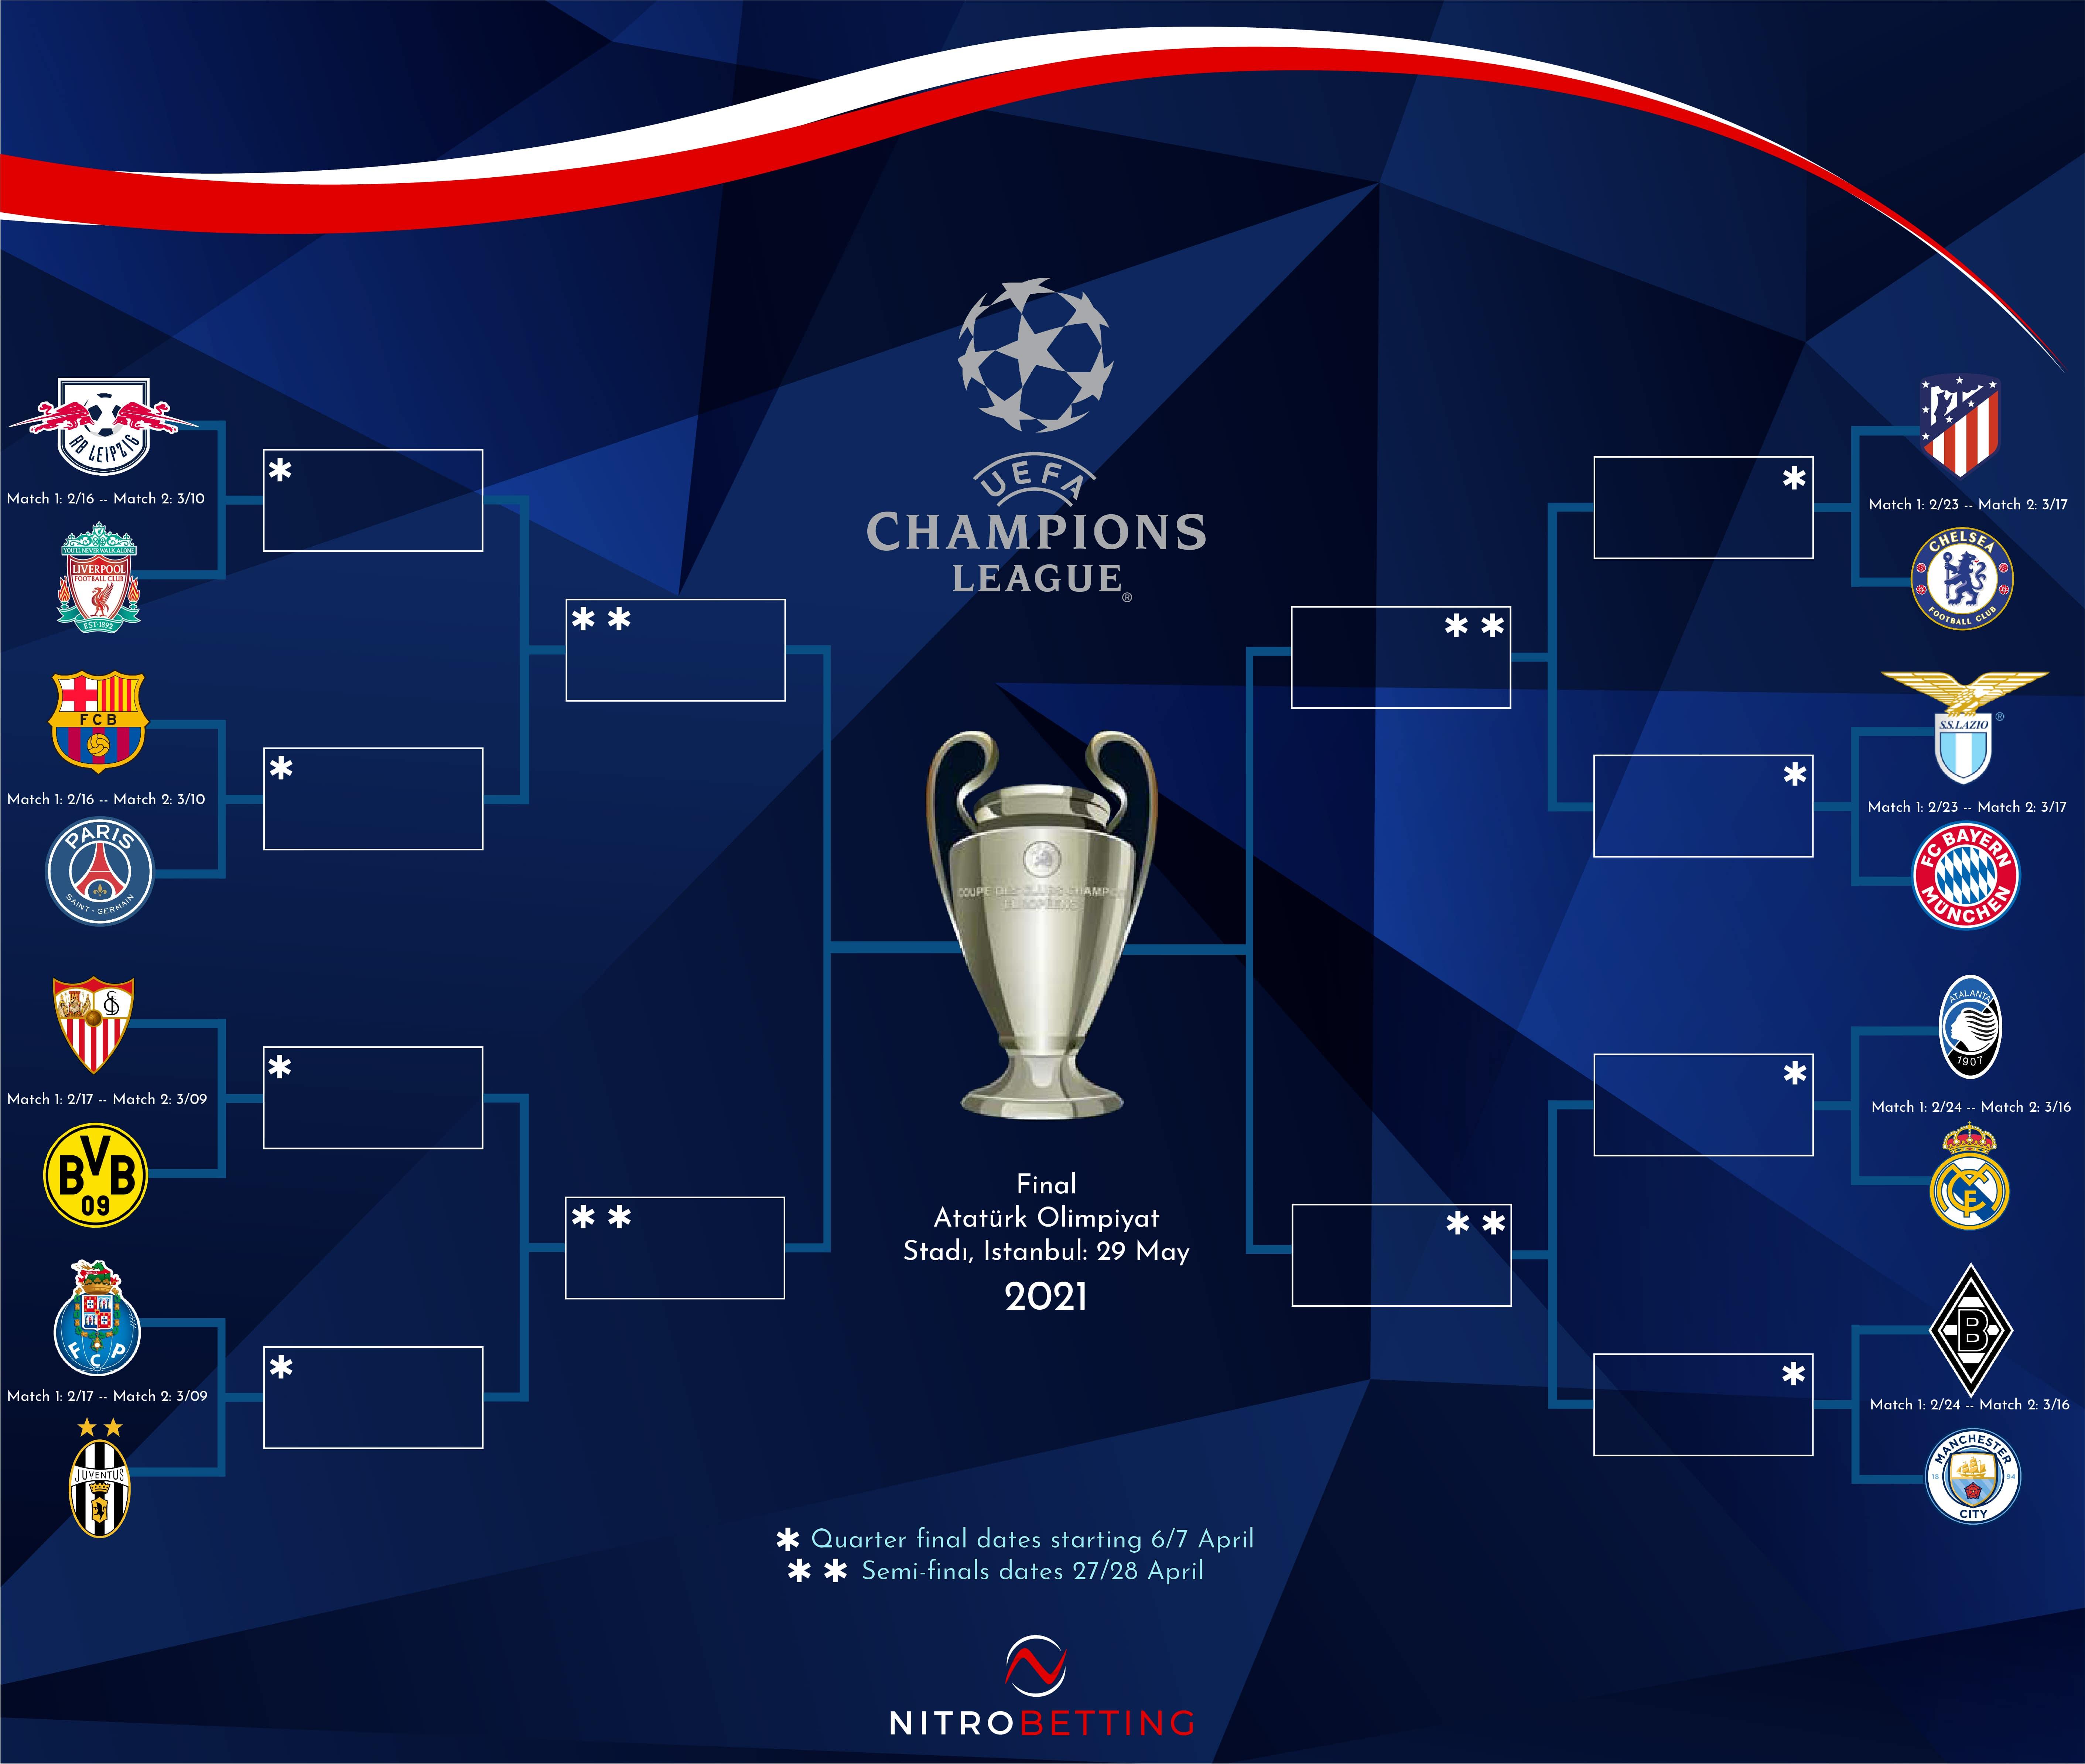 NitroBetting 2021 UEFA Champions League Bracket